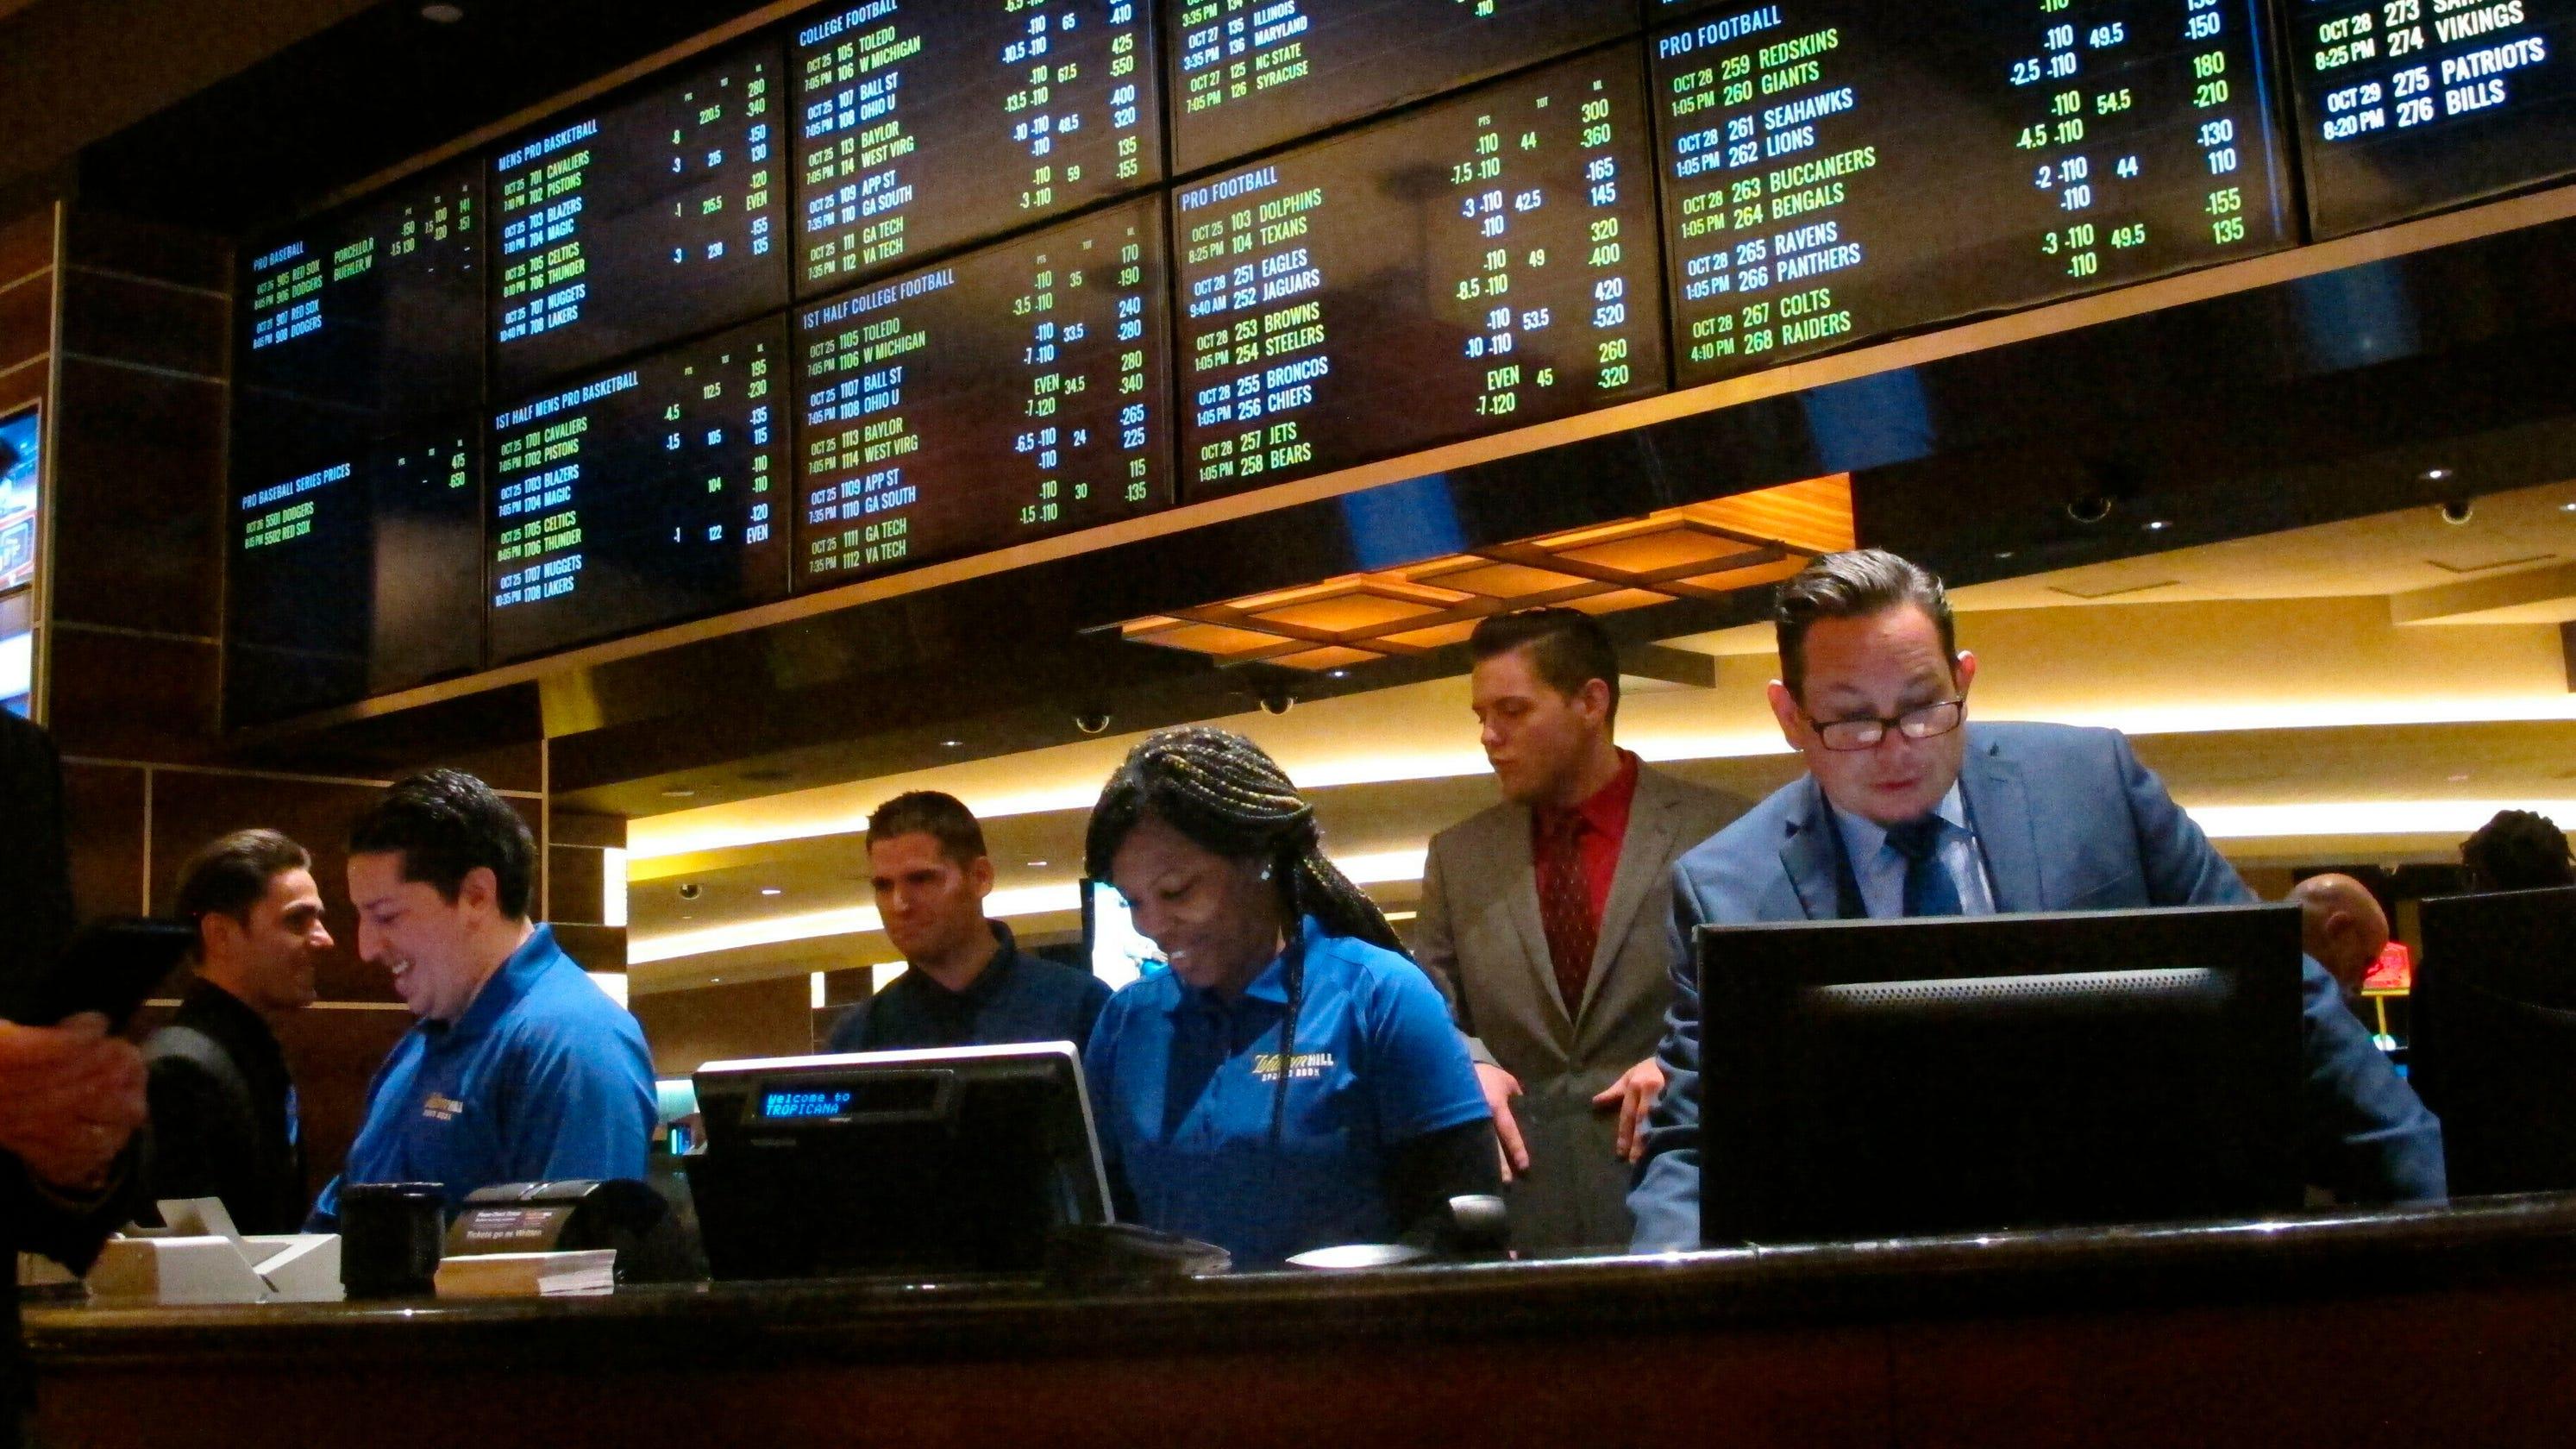 World star sports betting uganda jobline risk free matched betting forum